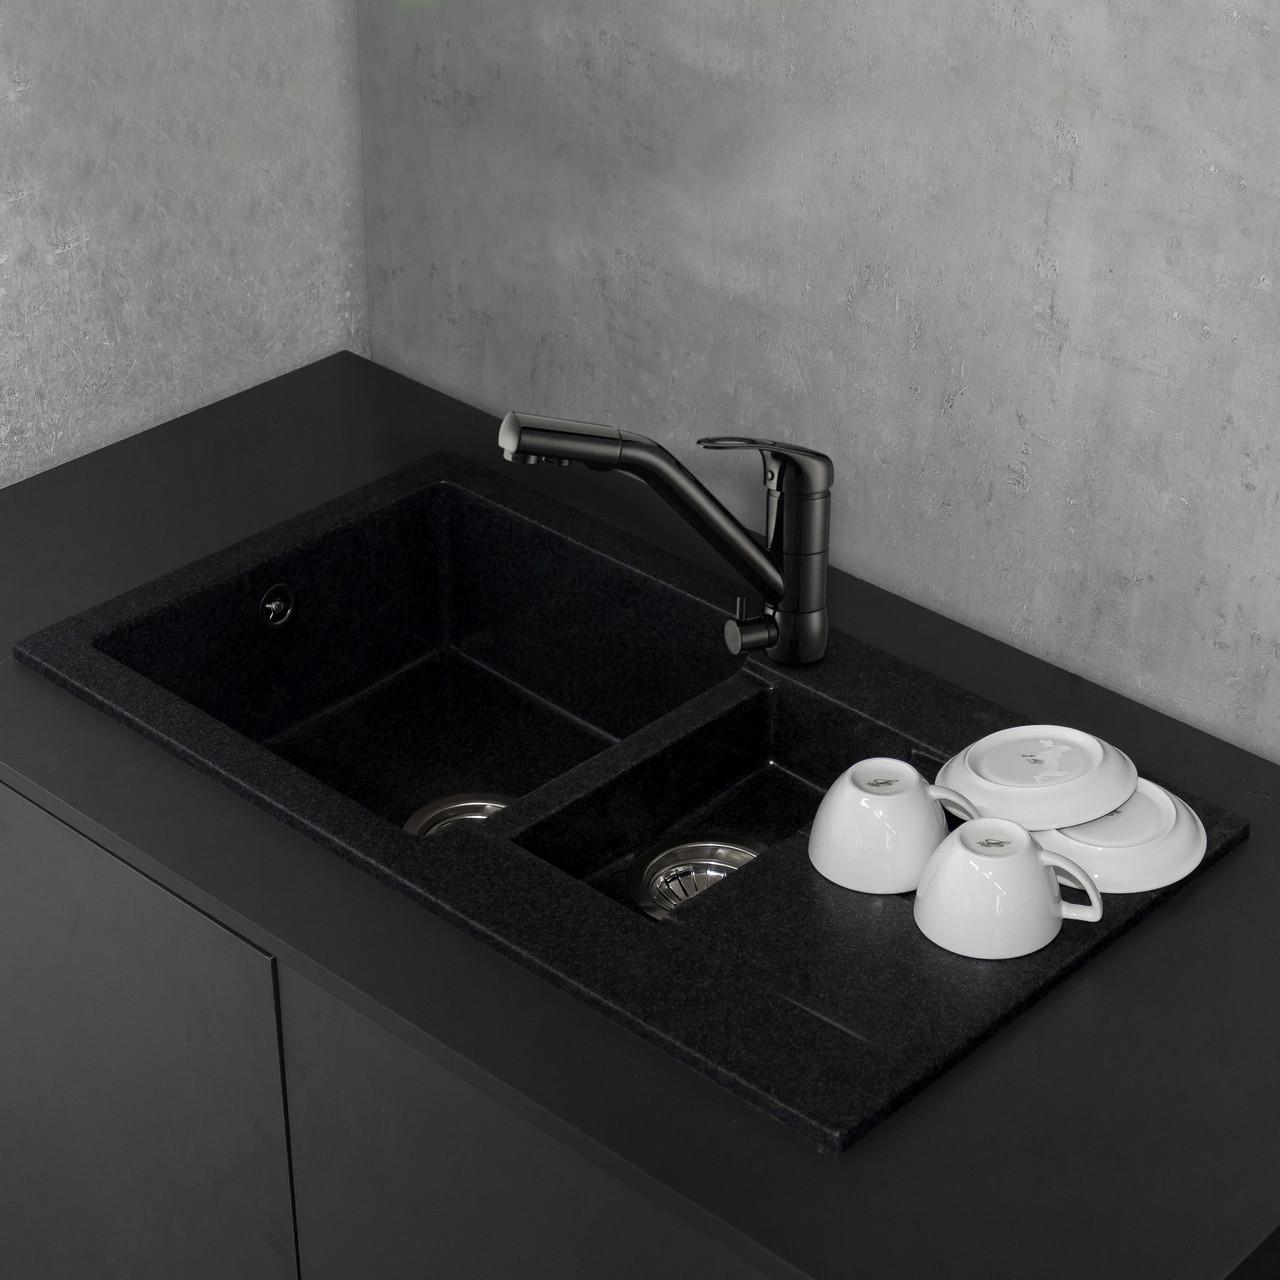 Кухонная мойка из литого камня Fancy Marble Alabama 780x435x160 мм